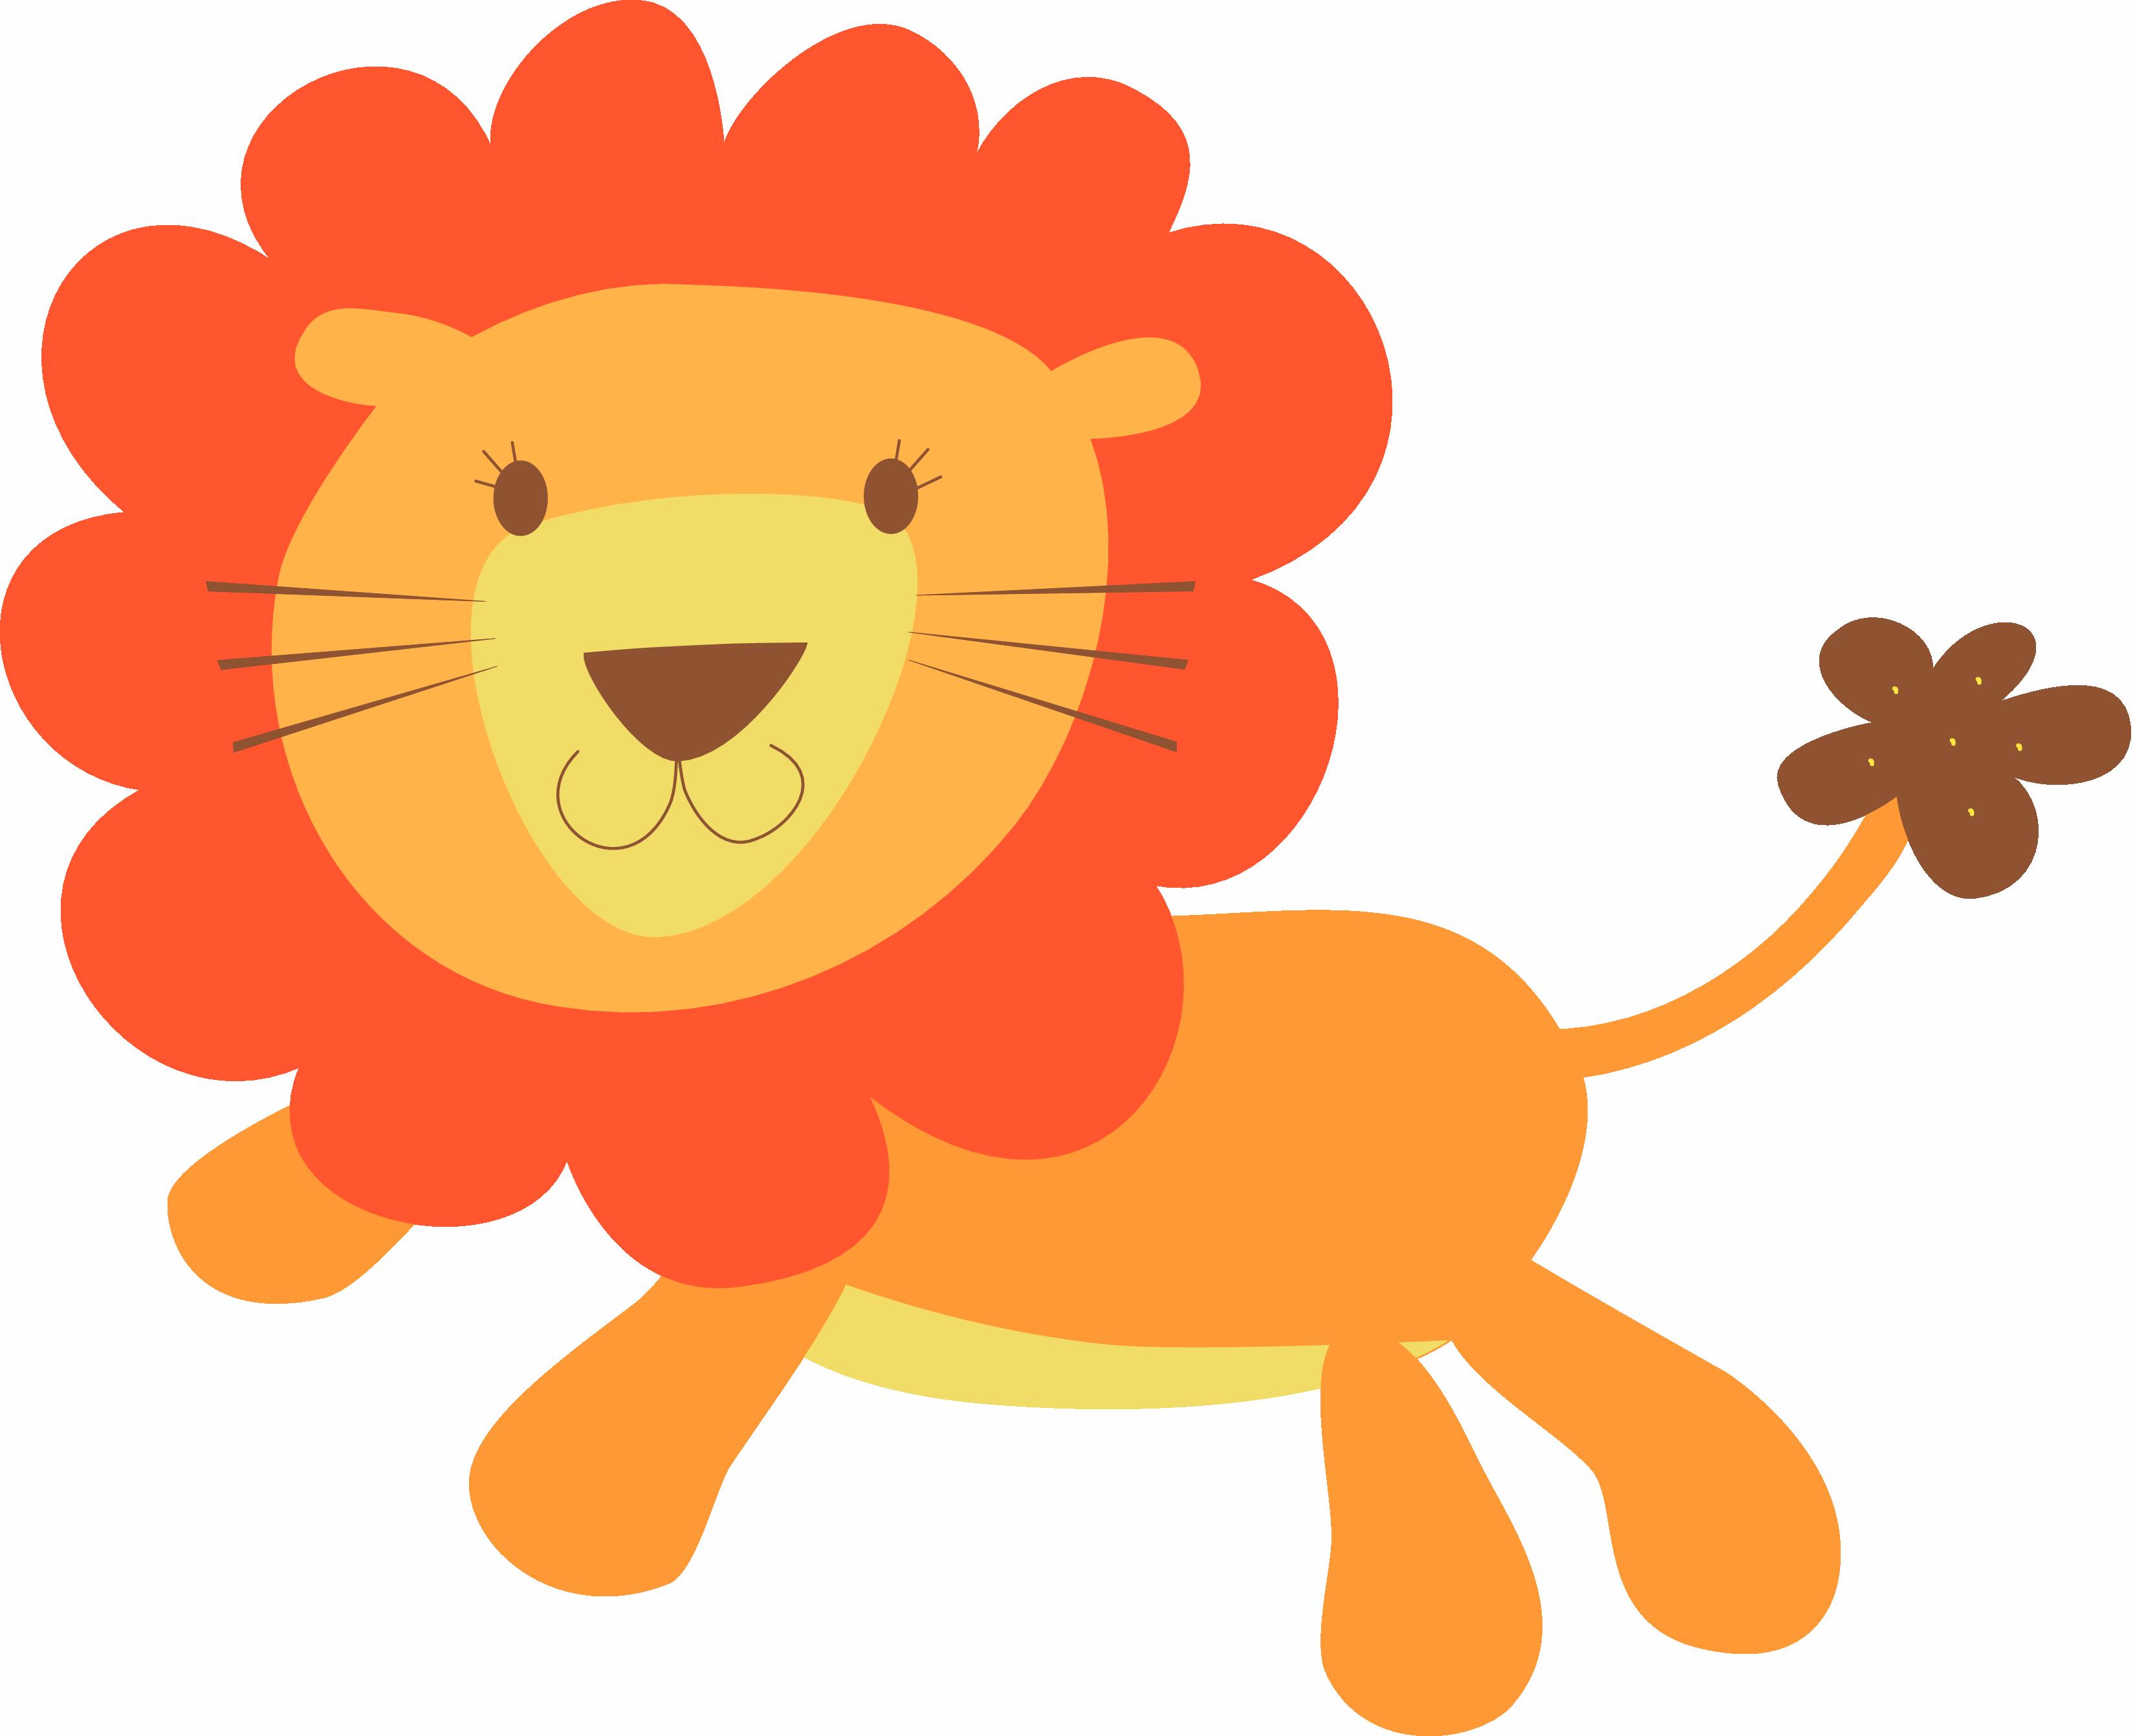 free clipart images lions - photo #37